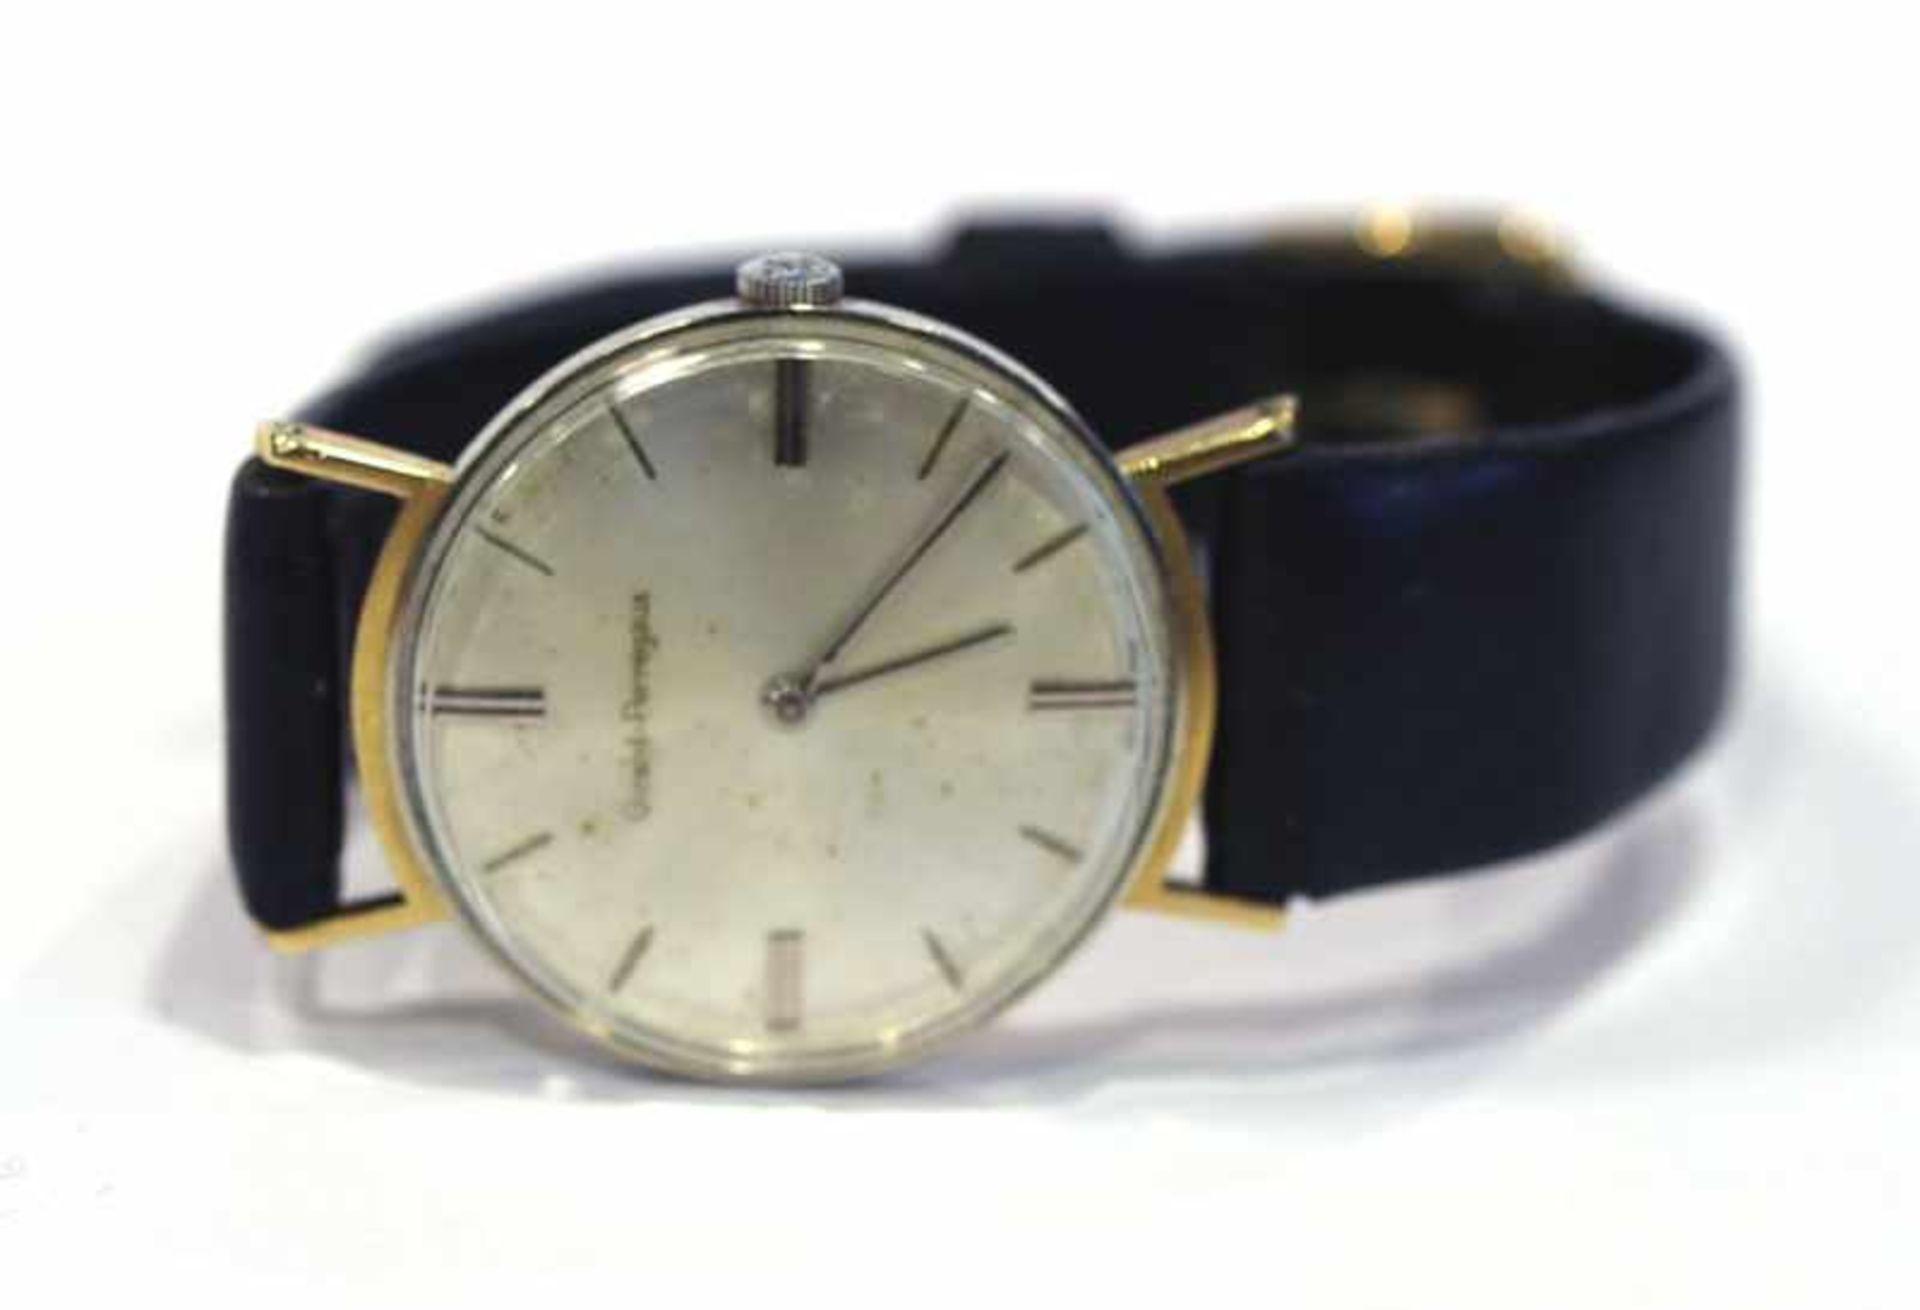 Damen Armbanduhr, Girard-Perregaux, 18 k Gelbgoldgehäuse an schwarzem Lederarmband, intakt,